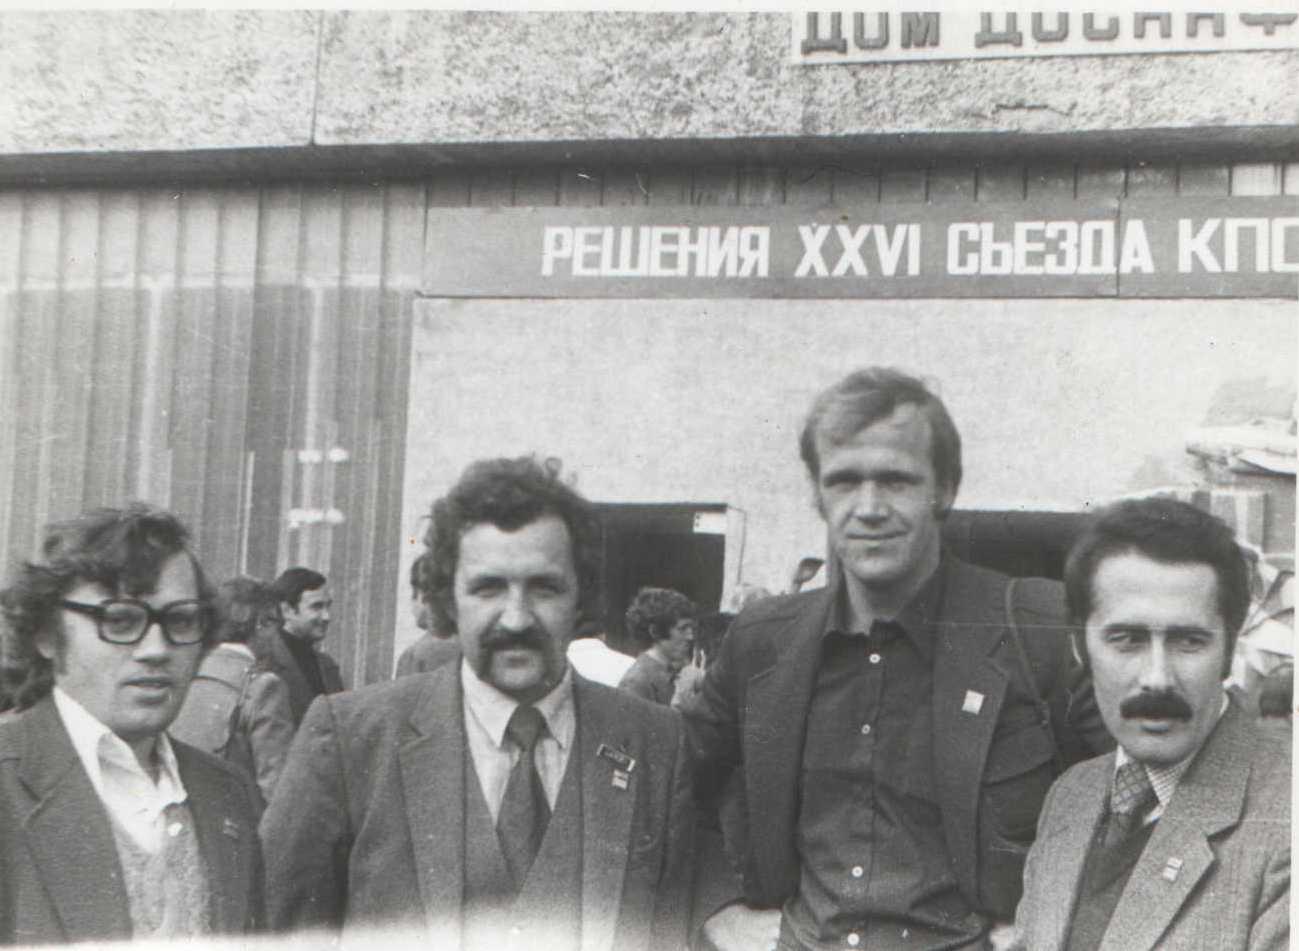 Нажмите на изображение для увеличения.  Название:Kiev-1983-UA3VCC-UB5GBD.jpg Просмотров:133 Размер:80.1 Кб ID:119631